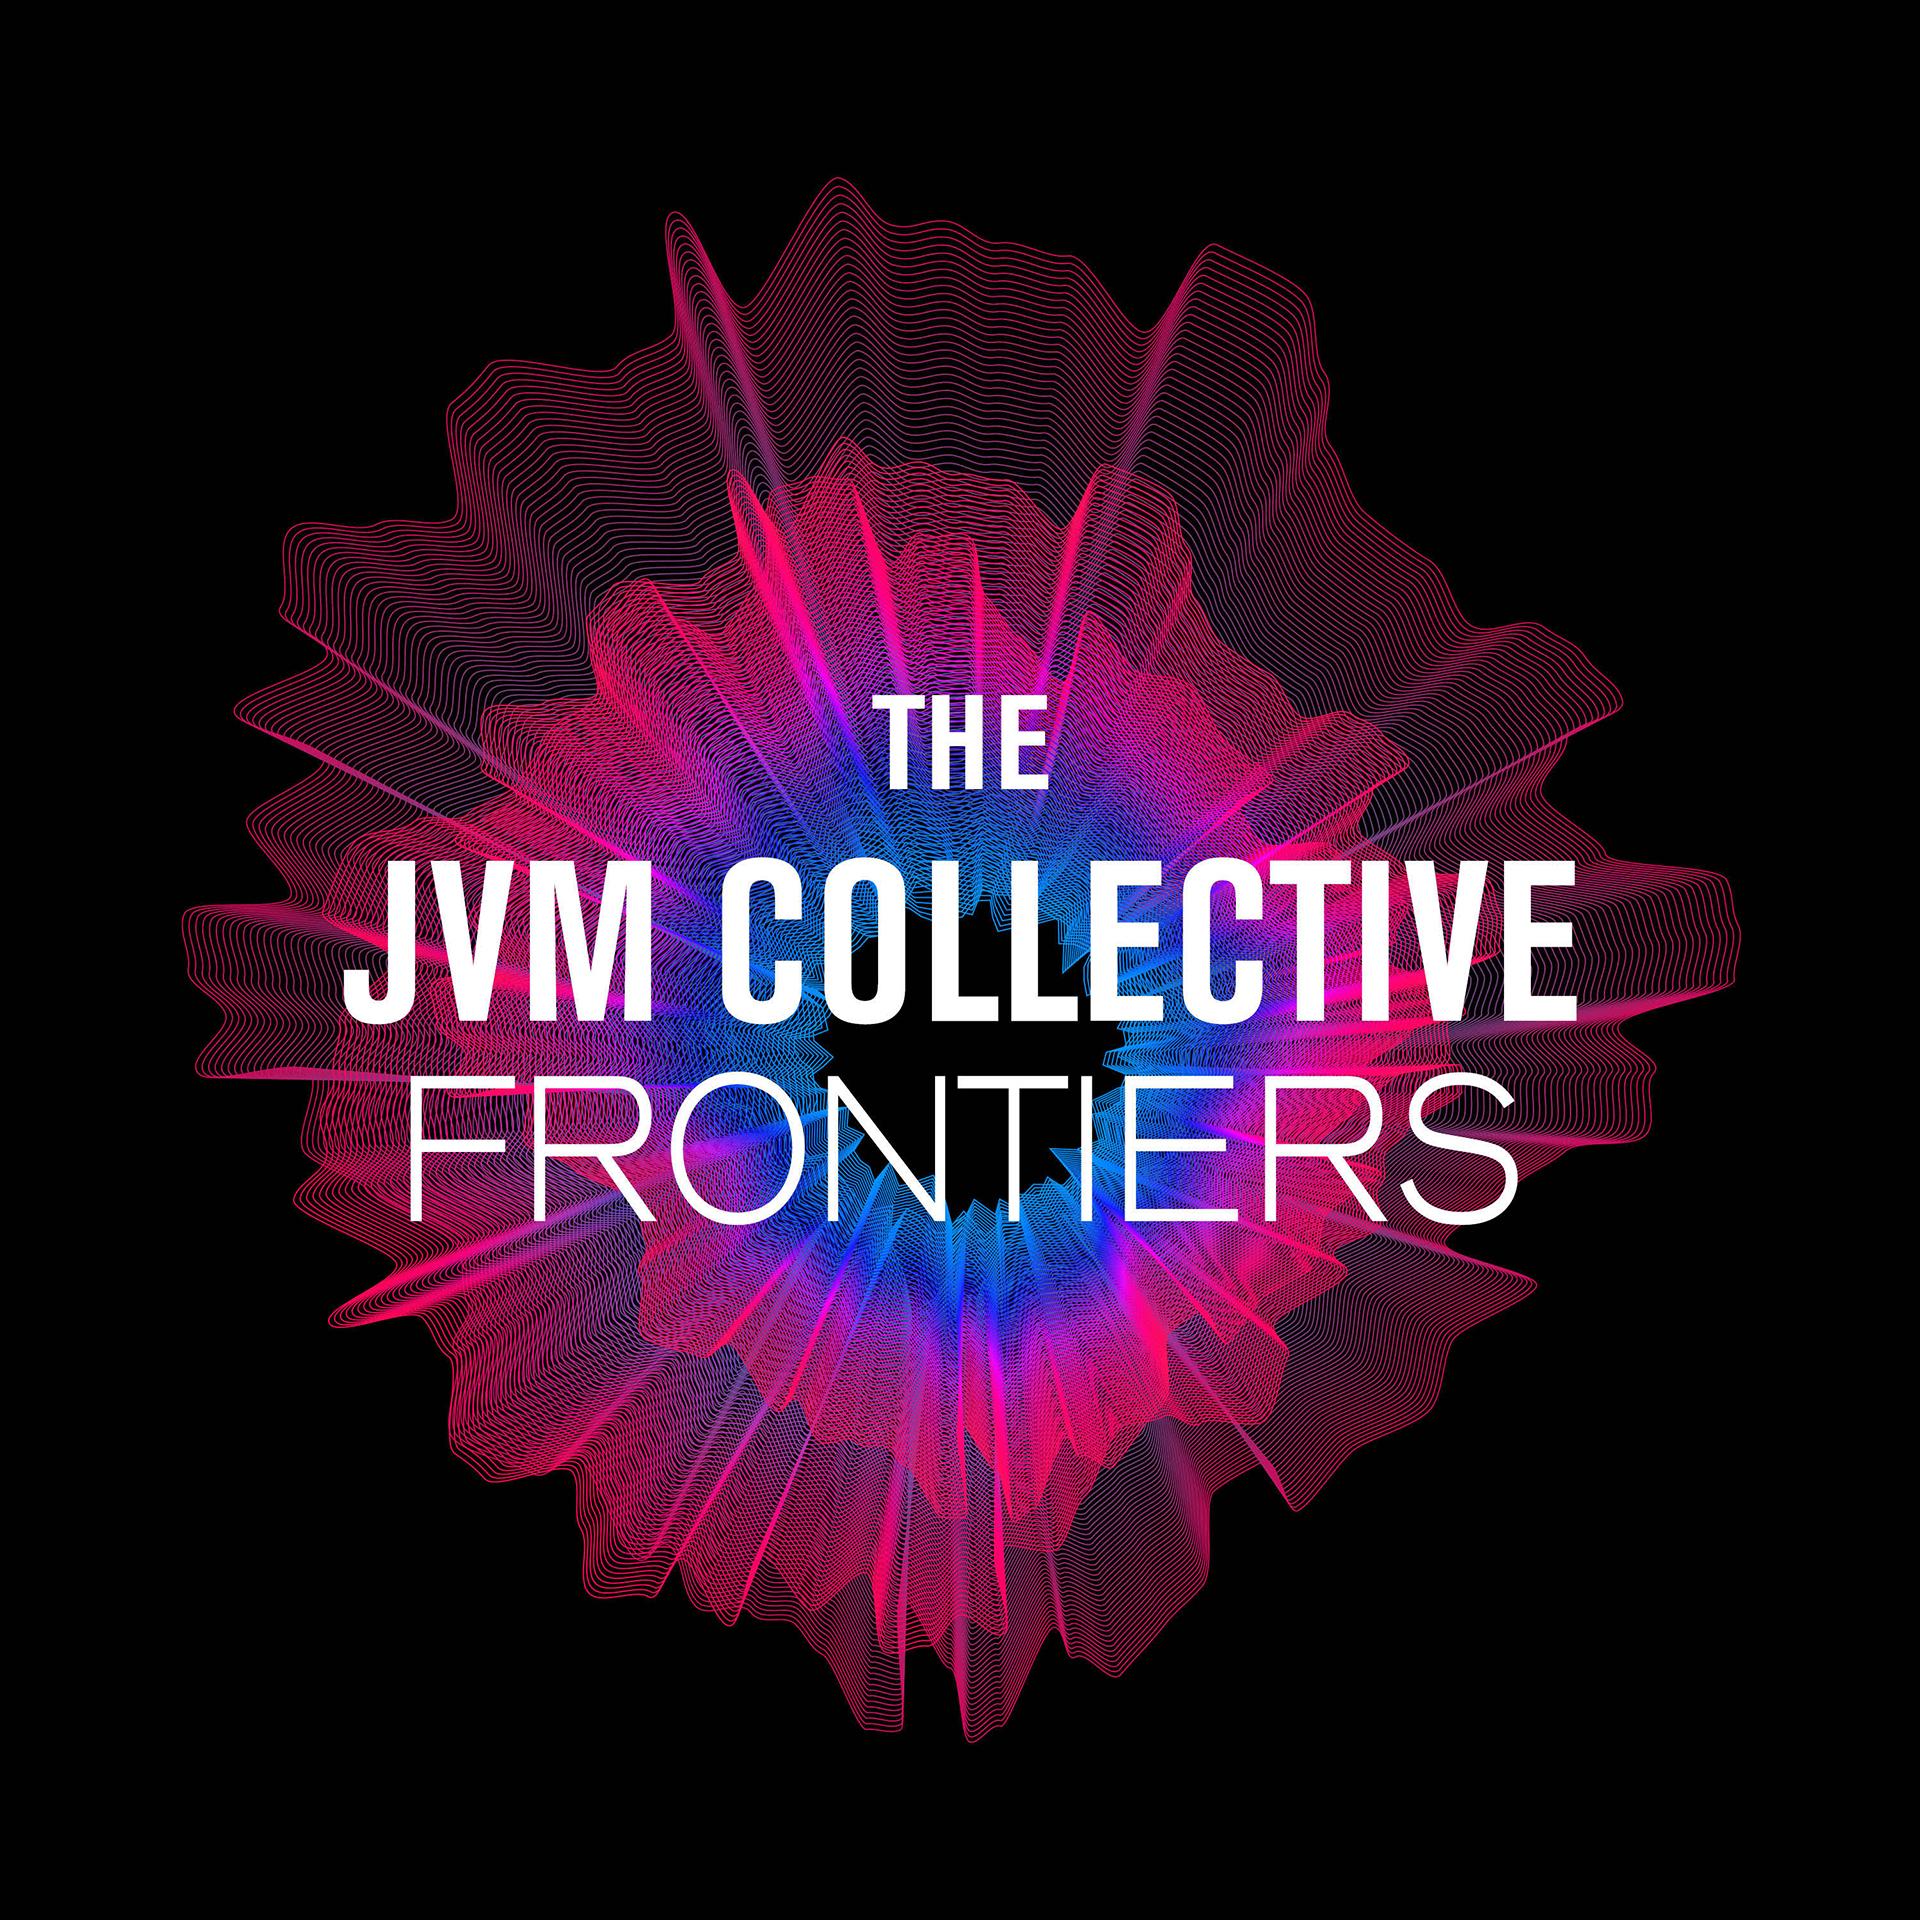 jvm_collective_frontiers